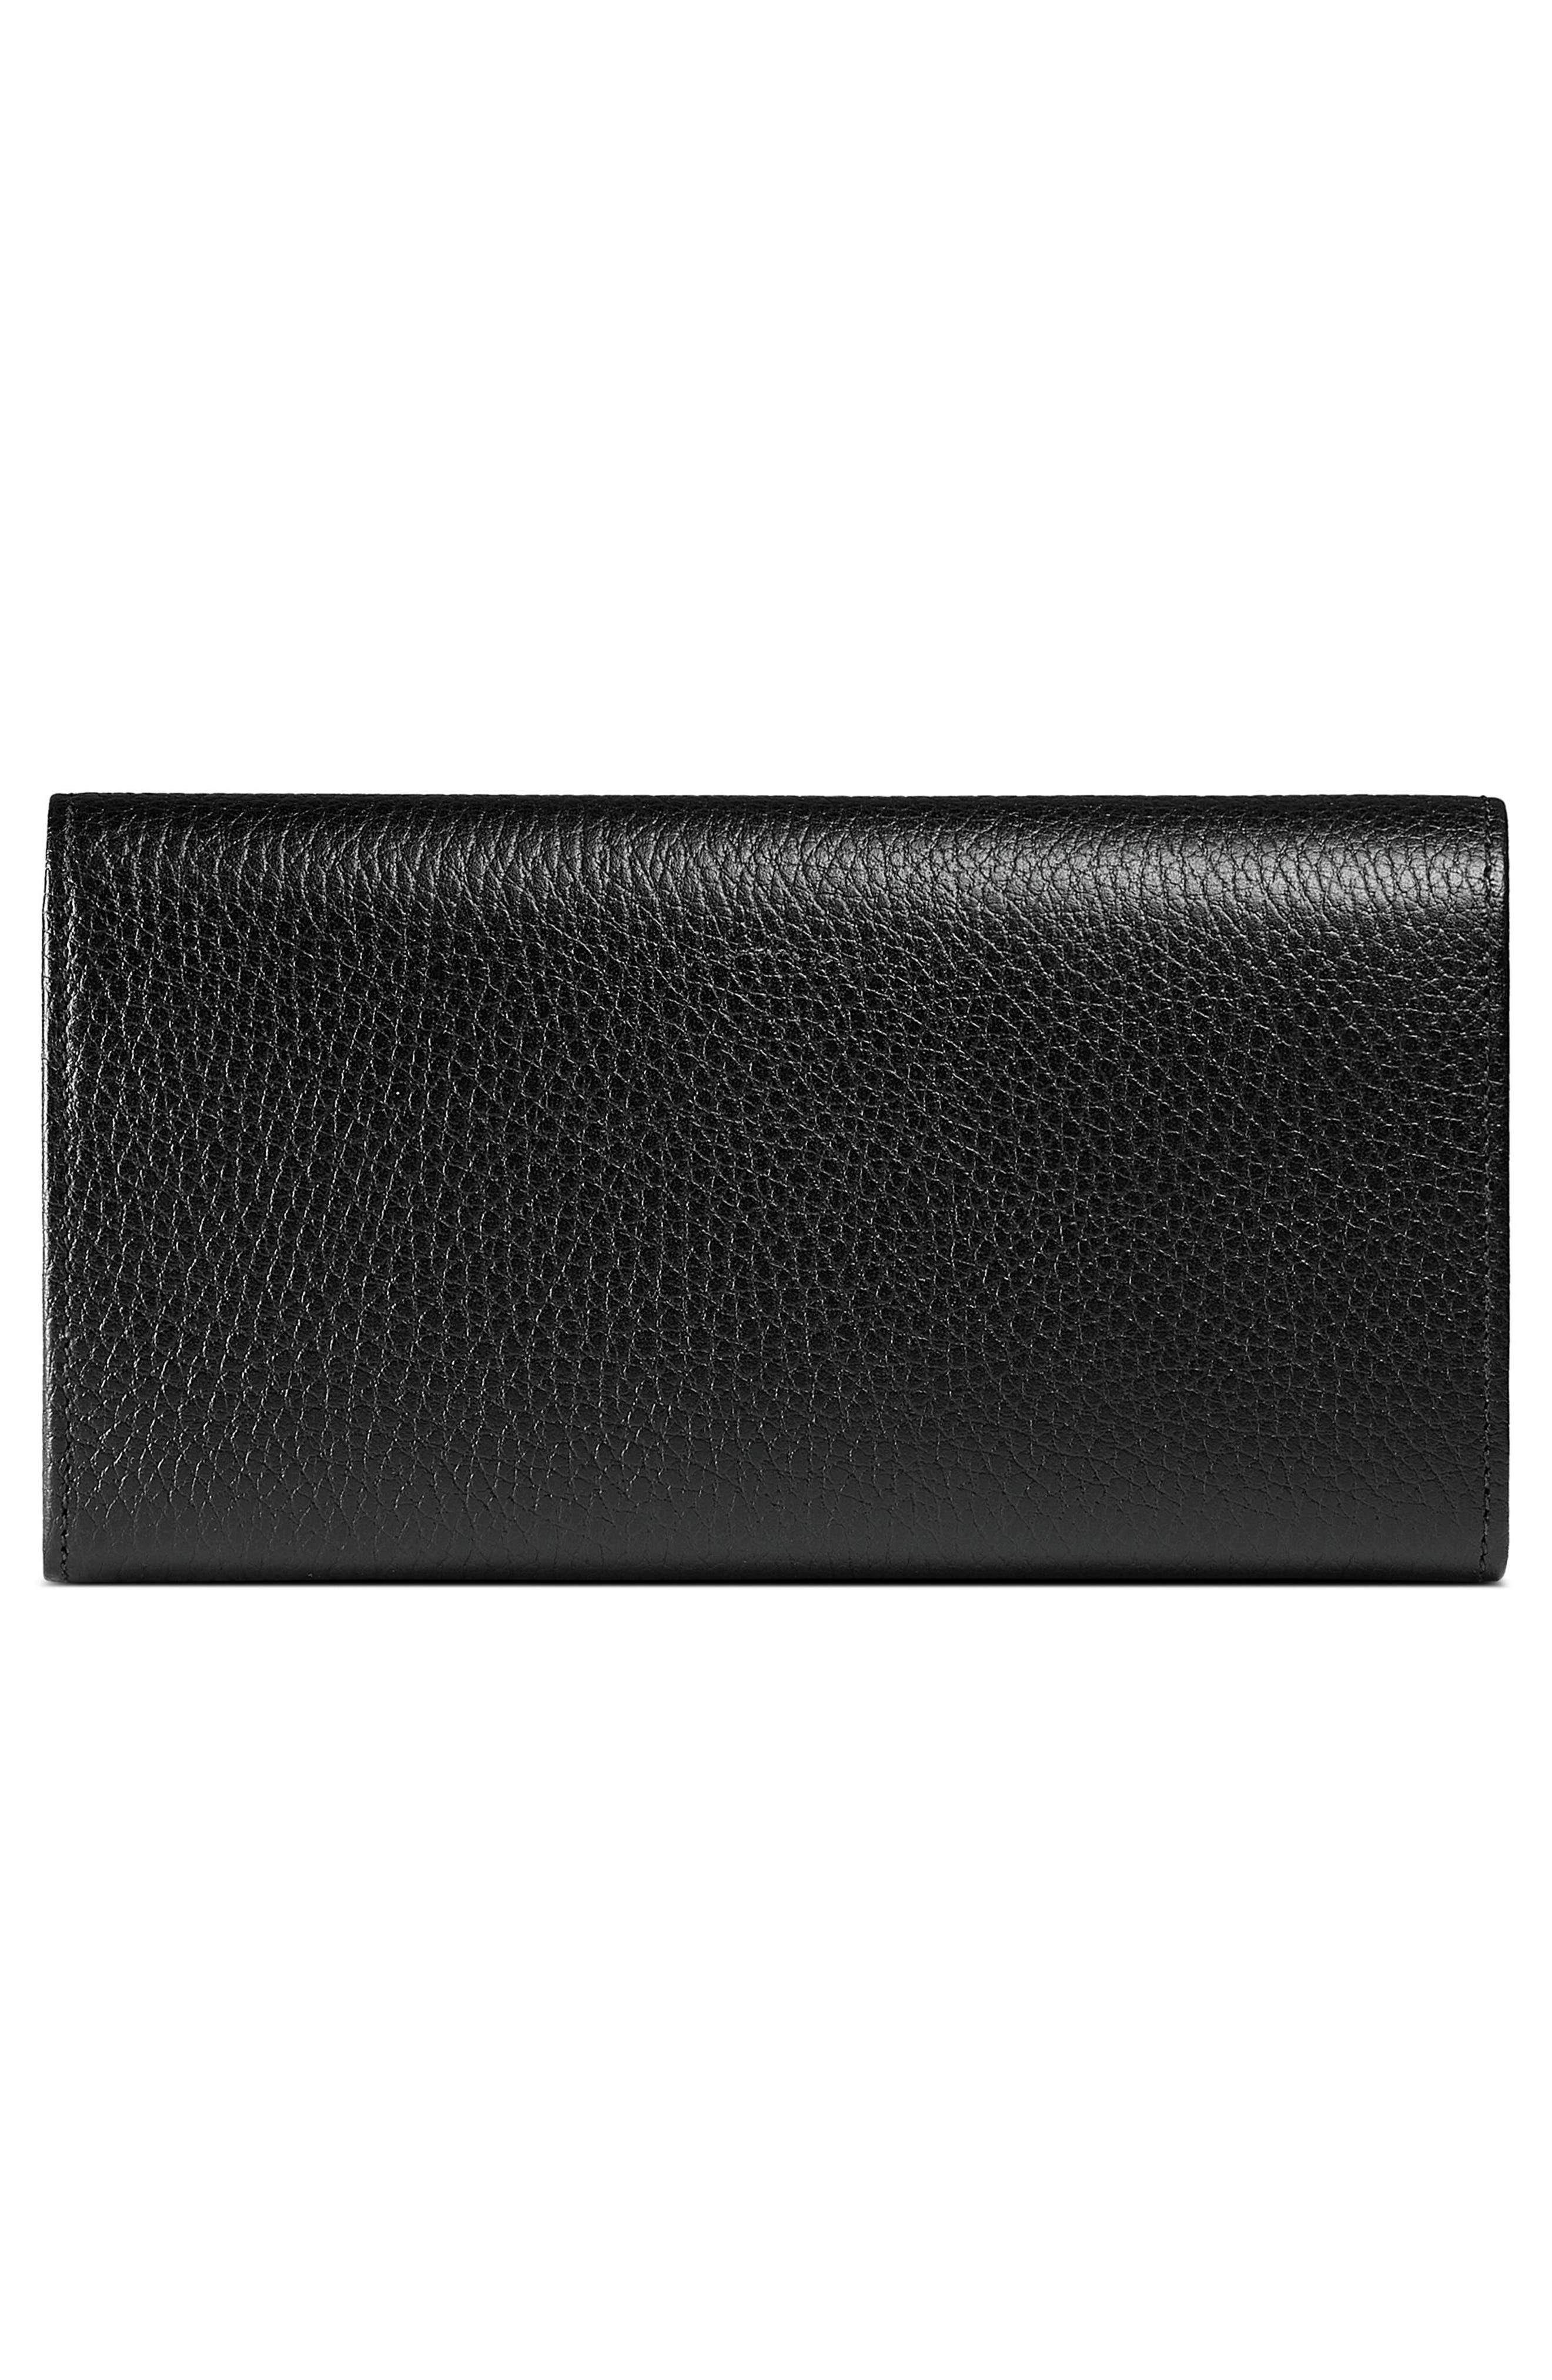 Farfalla Leather Continental Wallet,                             Alternate thumbnail 3, color,                             NERO/ CRYSTAL